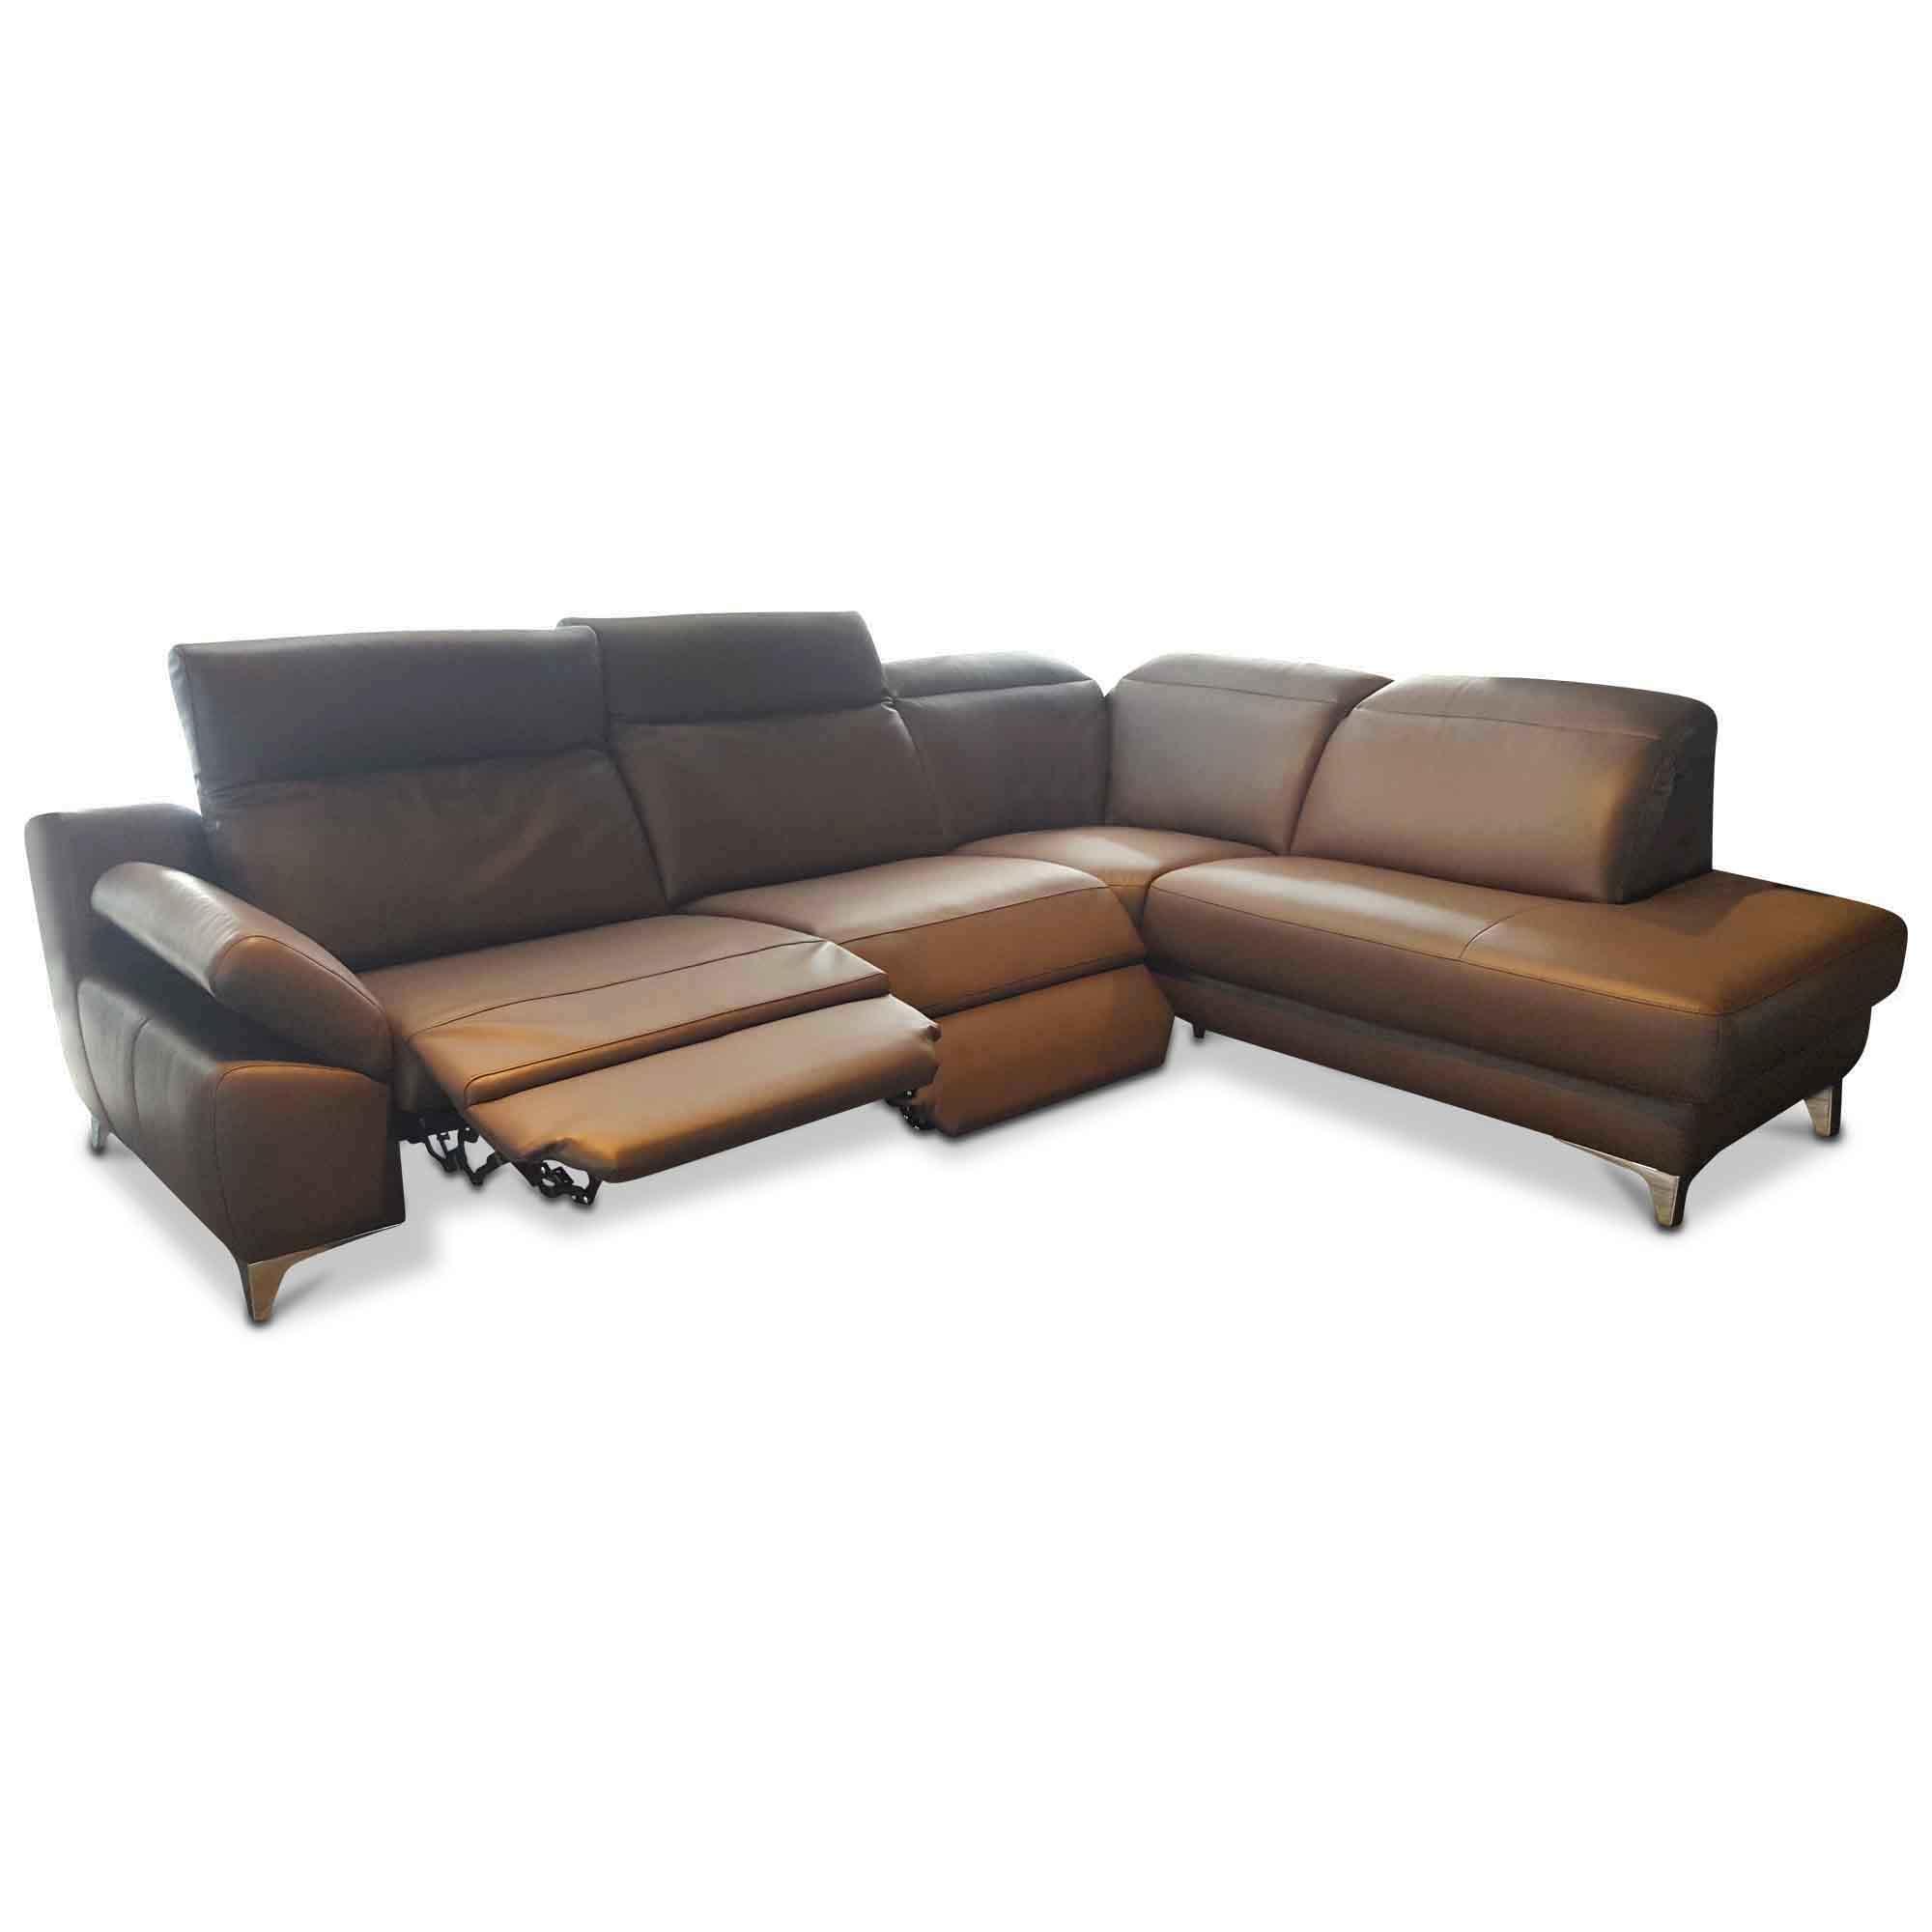 musterring designer ecksofa mr 9110 leder braun leder metall braun chrom ebay. Black Bedroom Furniture Sets. Home Design Ideas